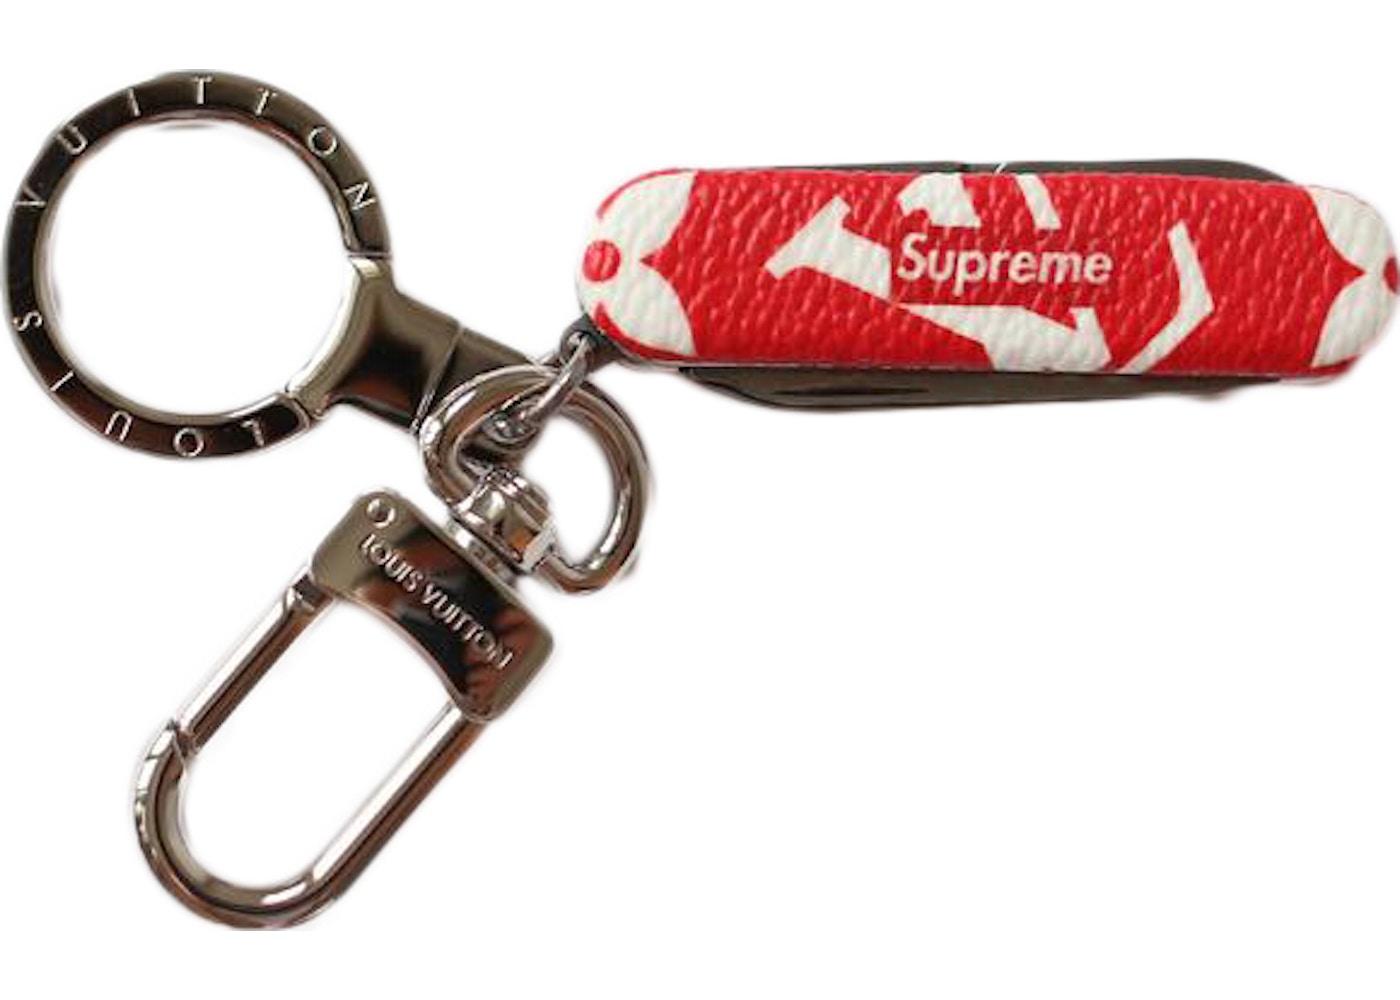 25587789158e3 Buy   Sell Louis Vuitton Supreme Handbags